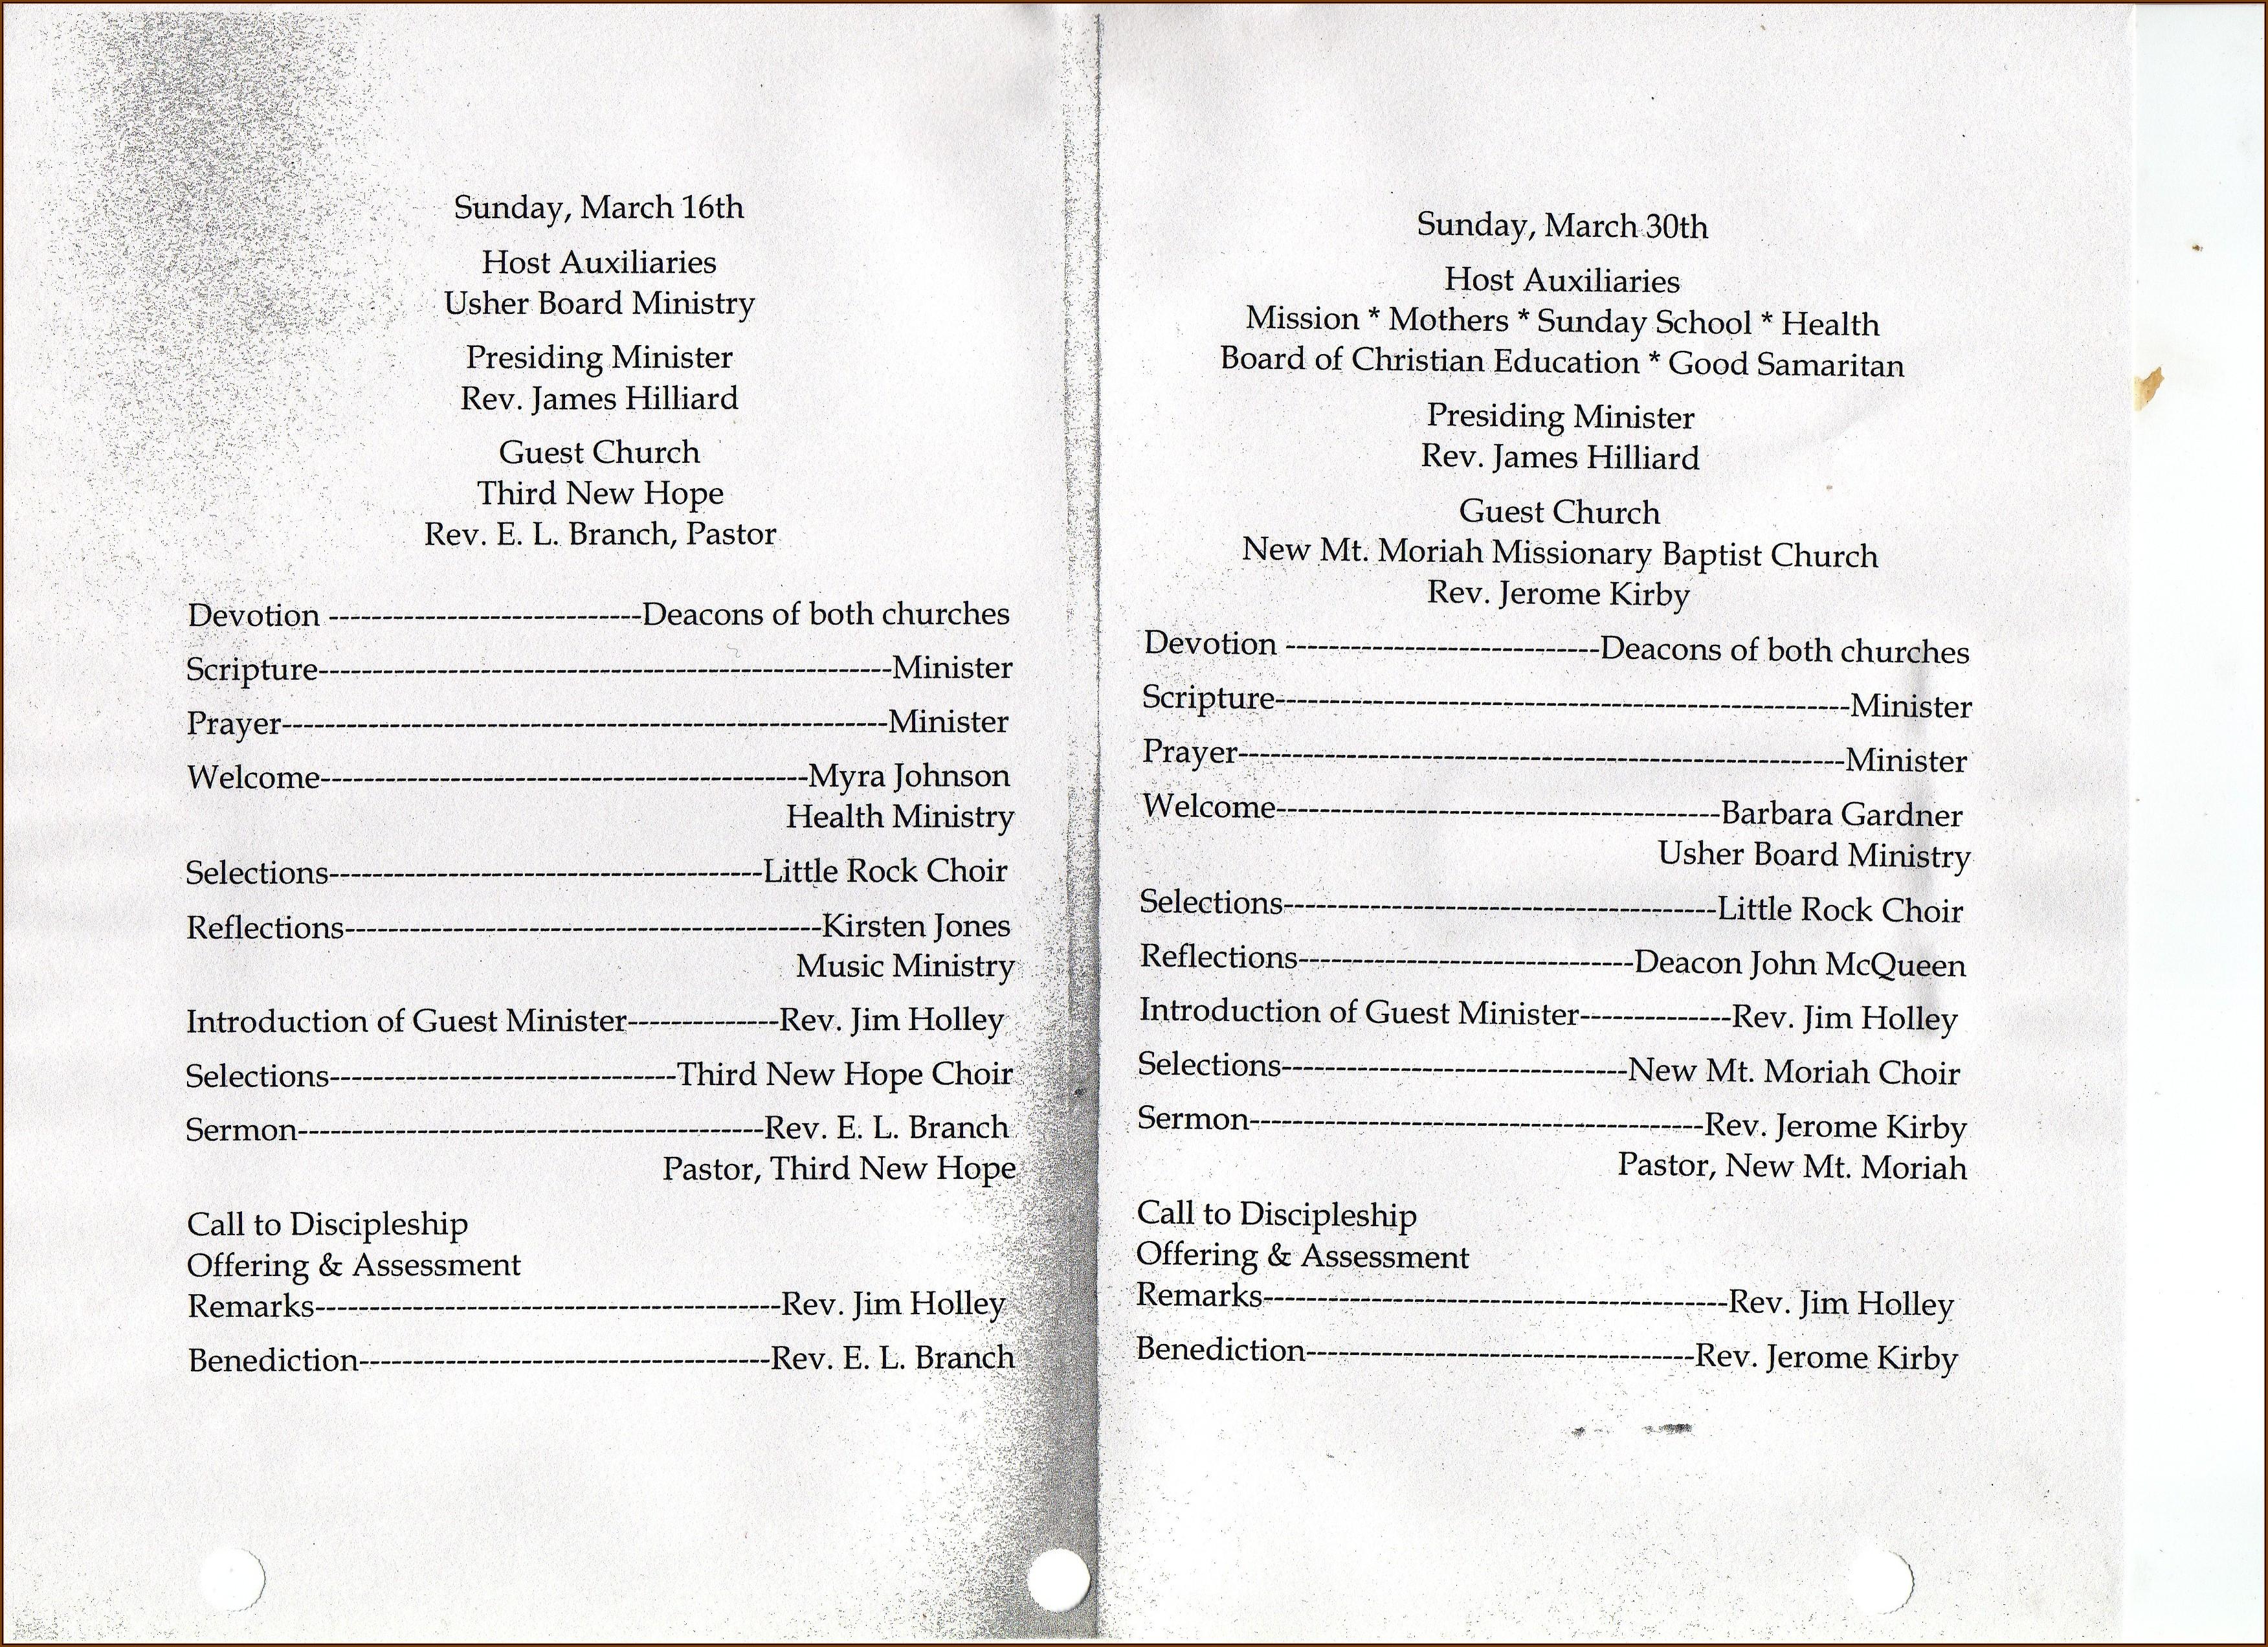 Church Anniversary Program Outline Template